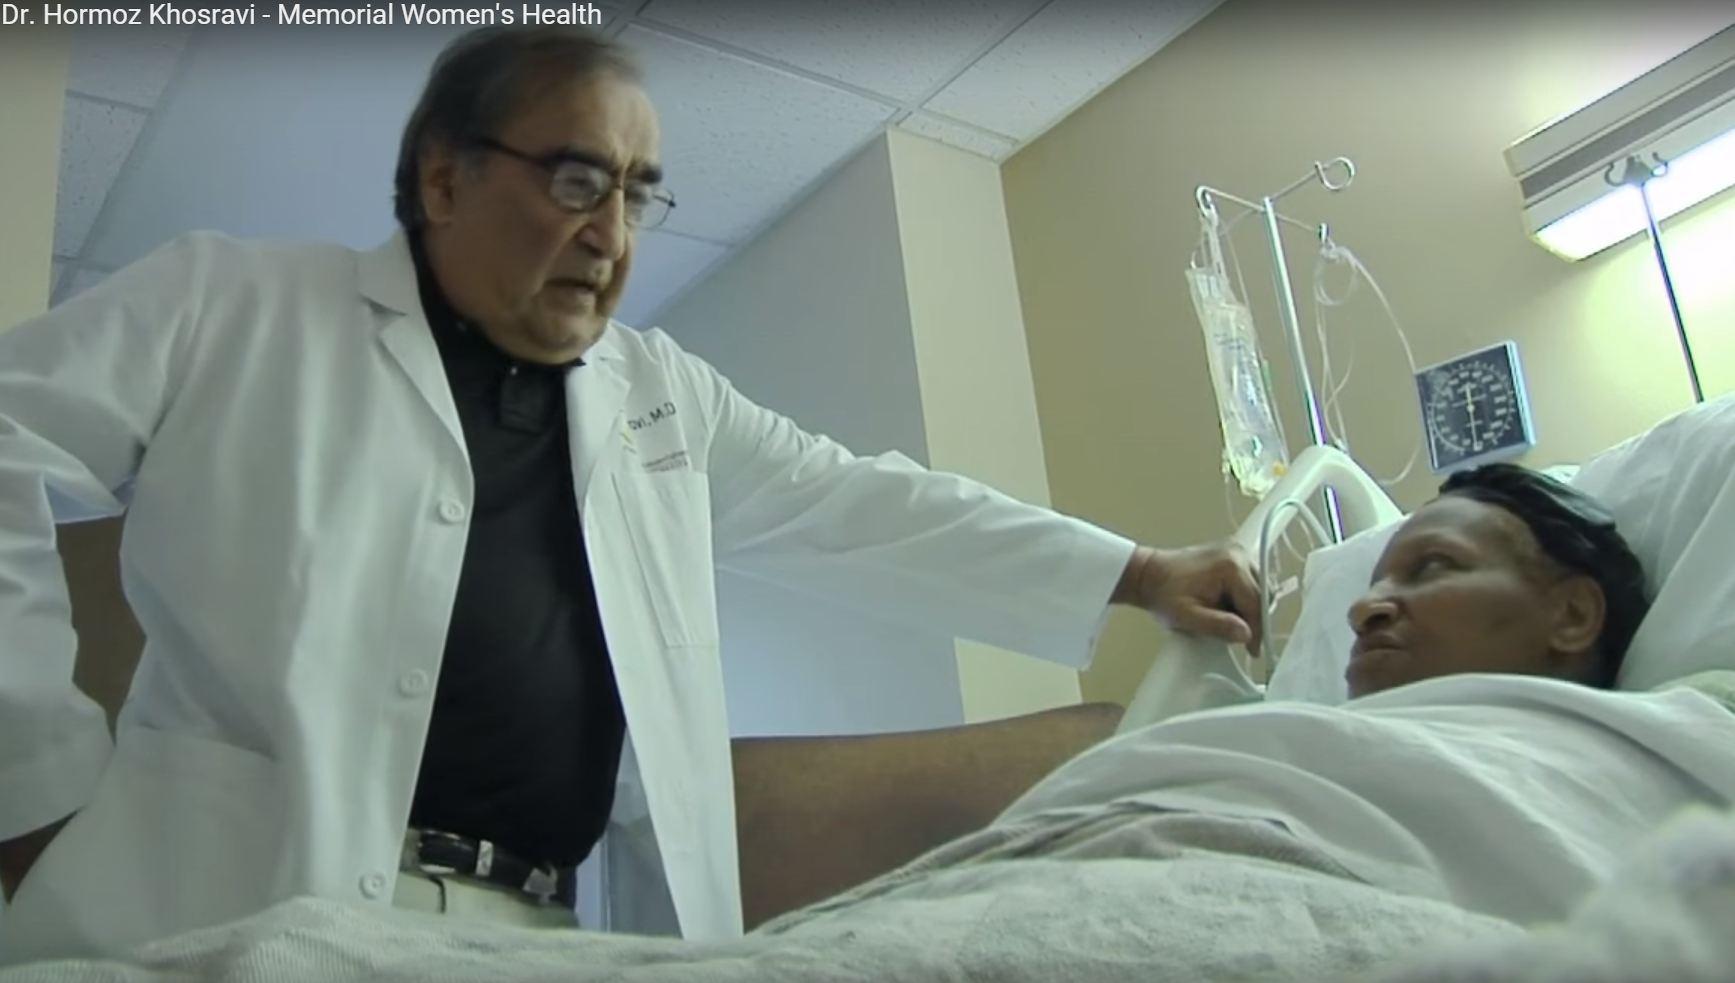 Dr. Khosravi talks about his practice